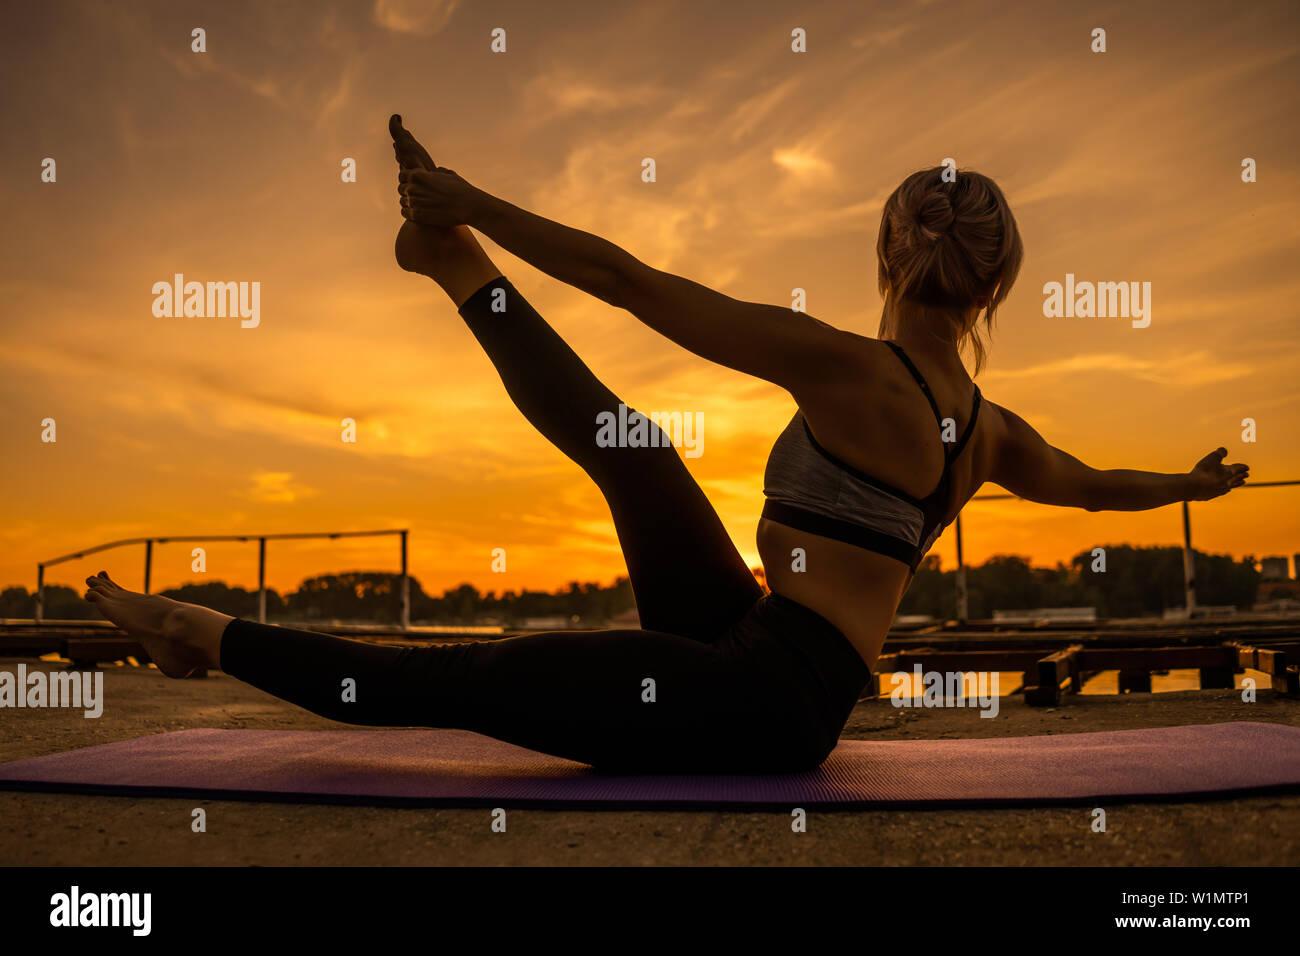 Woman practicing yoga in sunset. Padangusthasana, Dancing Shiva Pose - Stock Image